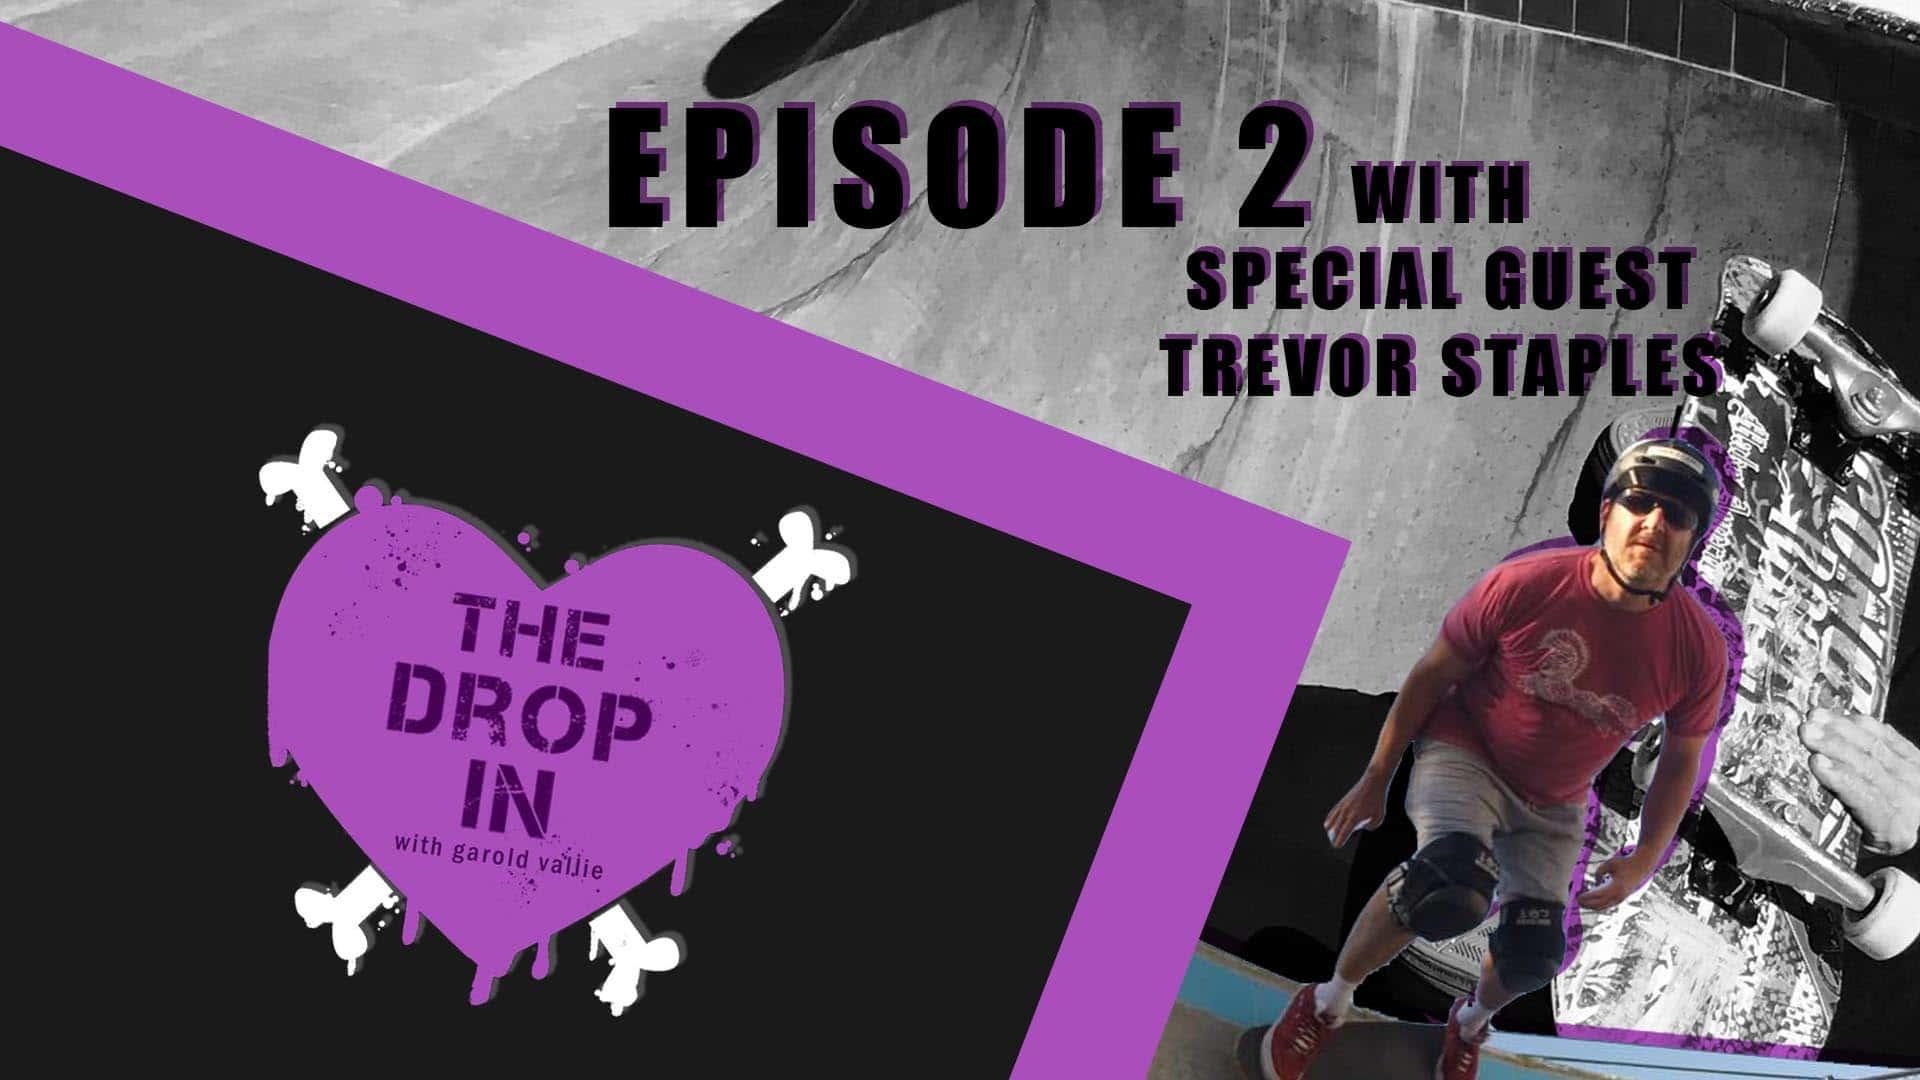 The Drop In With Garold Vallie - Episode 2